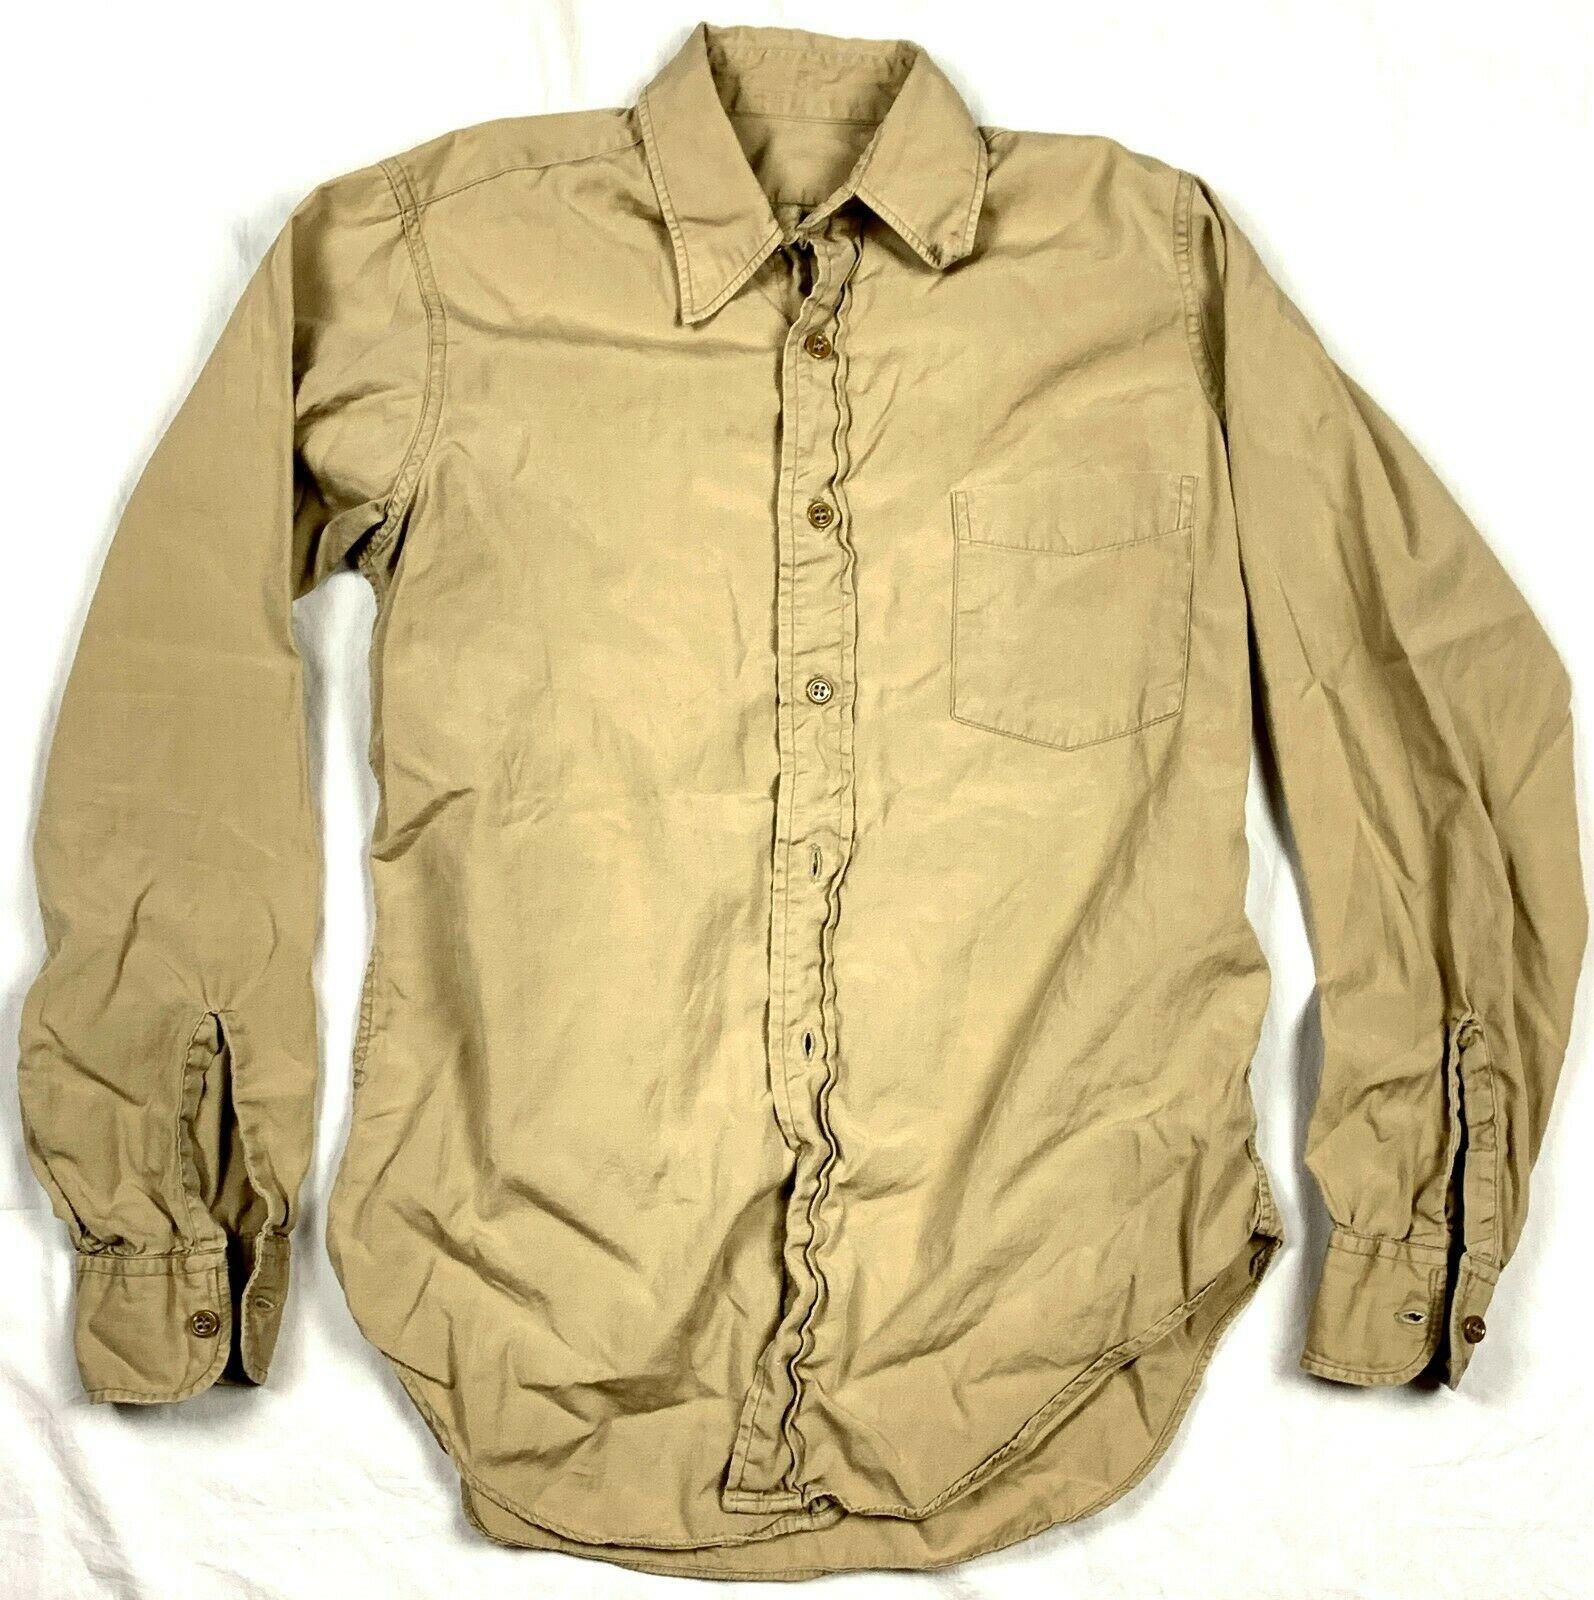 Vtg WWII Korean US Army Military Infantry Khaki Long Sleeve Uniform Dress Shirt - $44.99